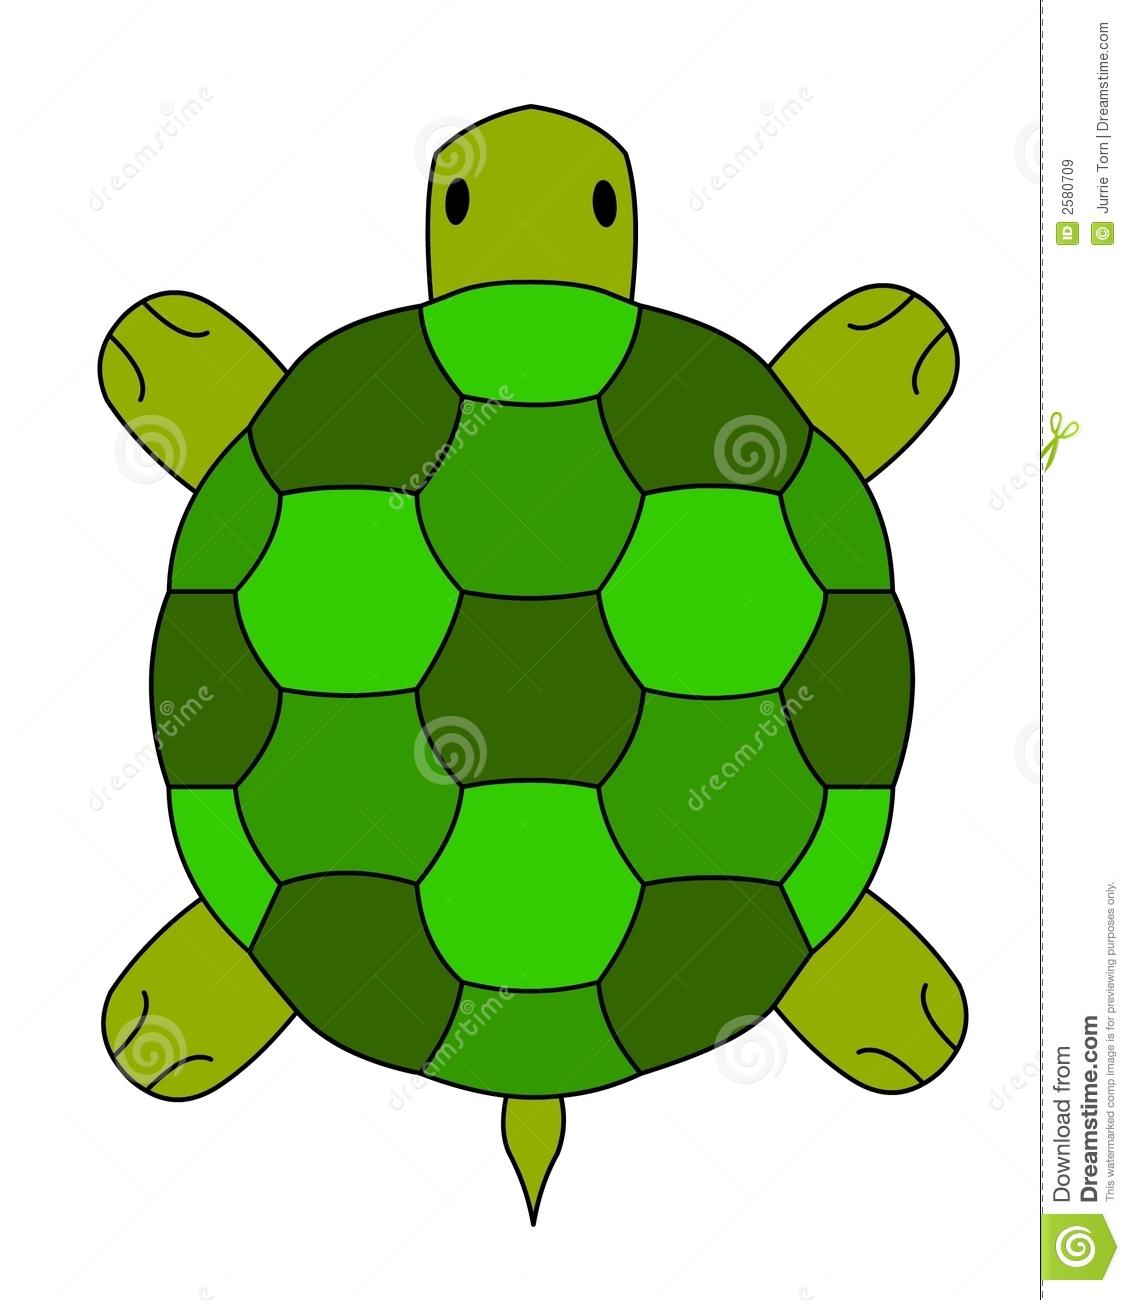 Land Turtle Illustration Royalty Free Stock Images.